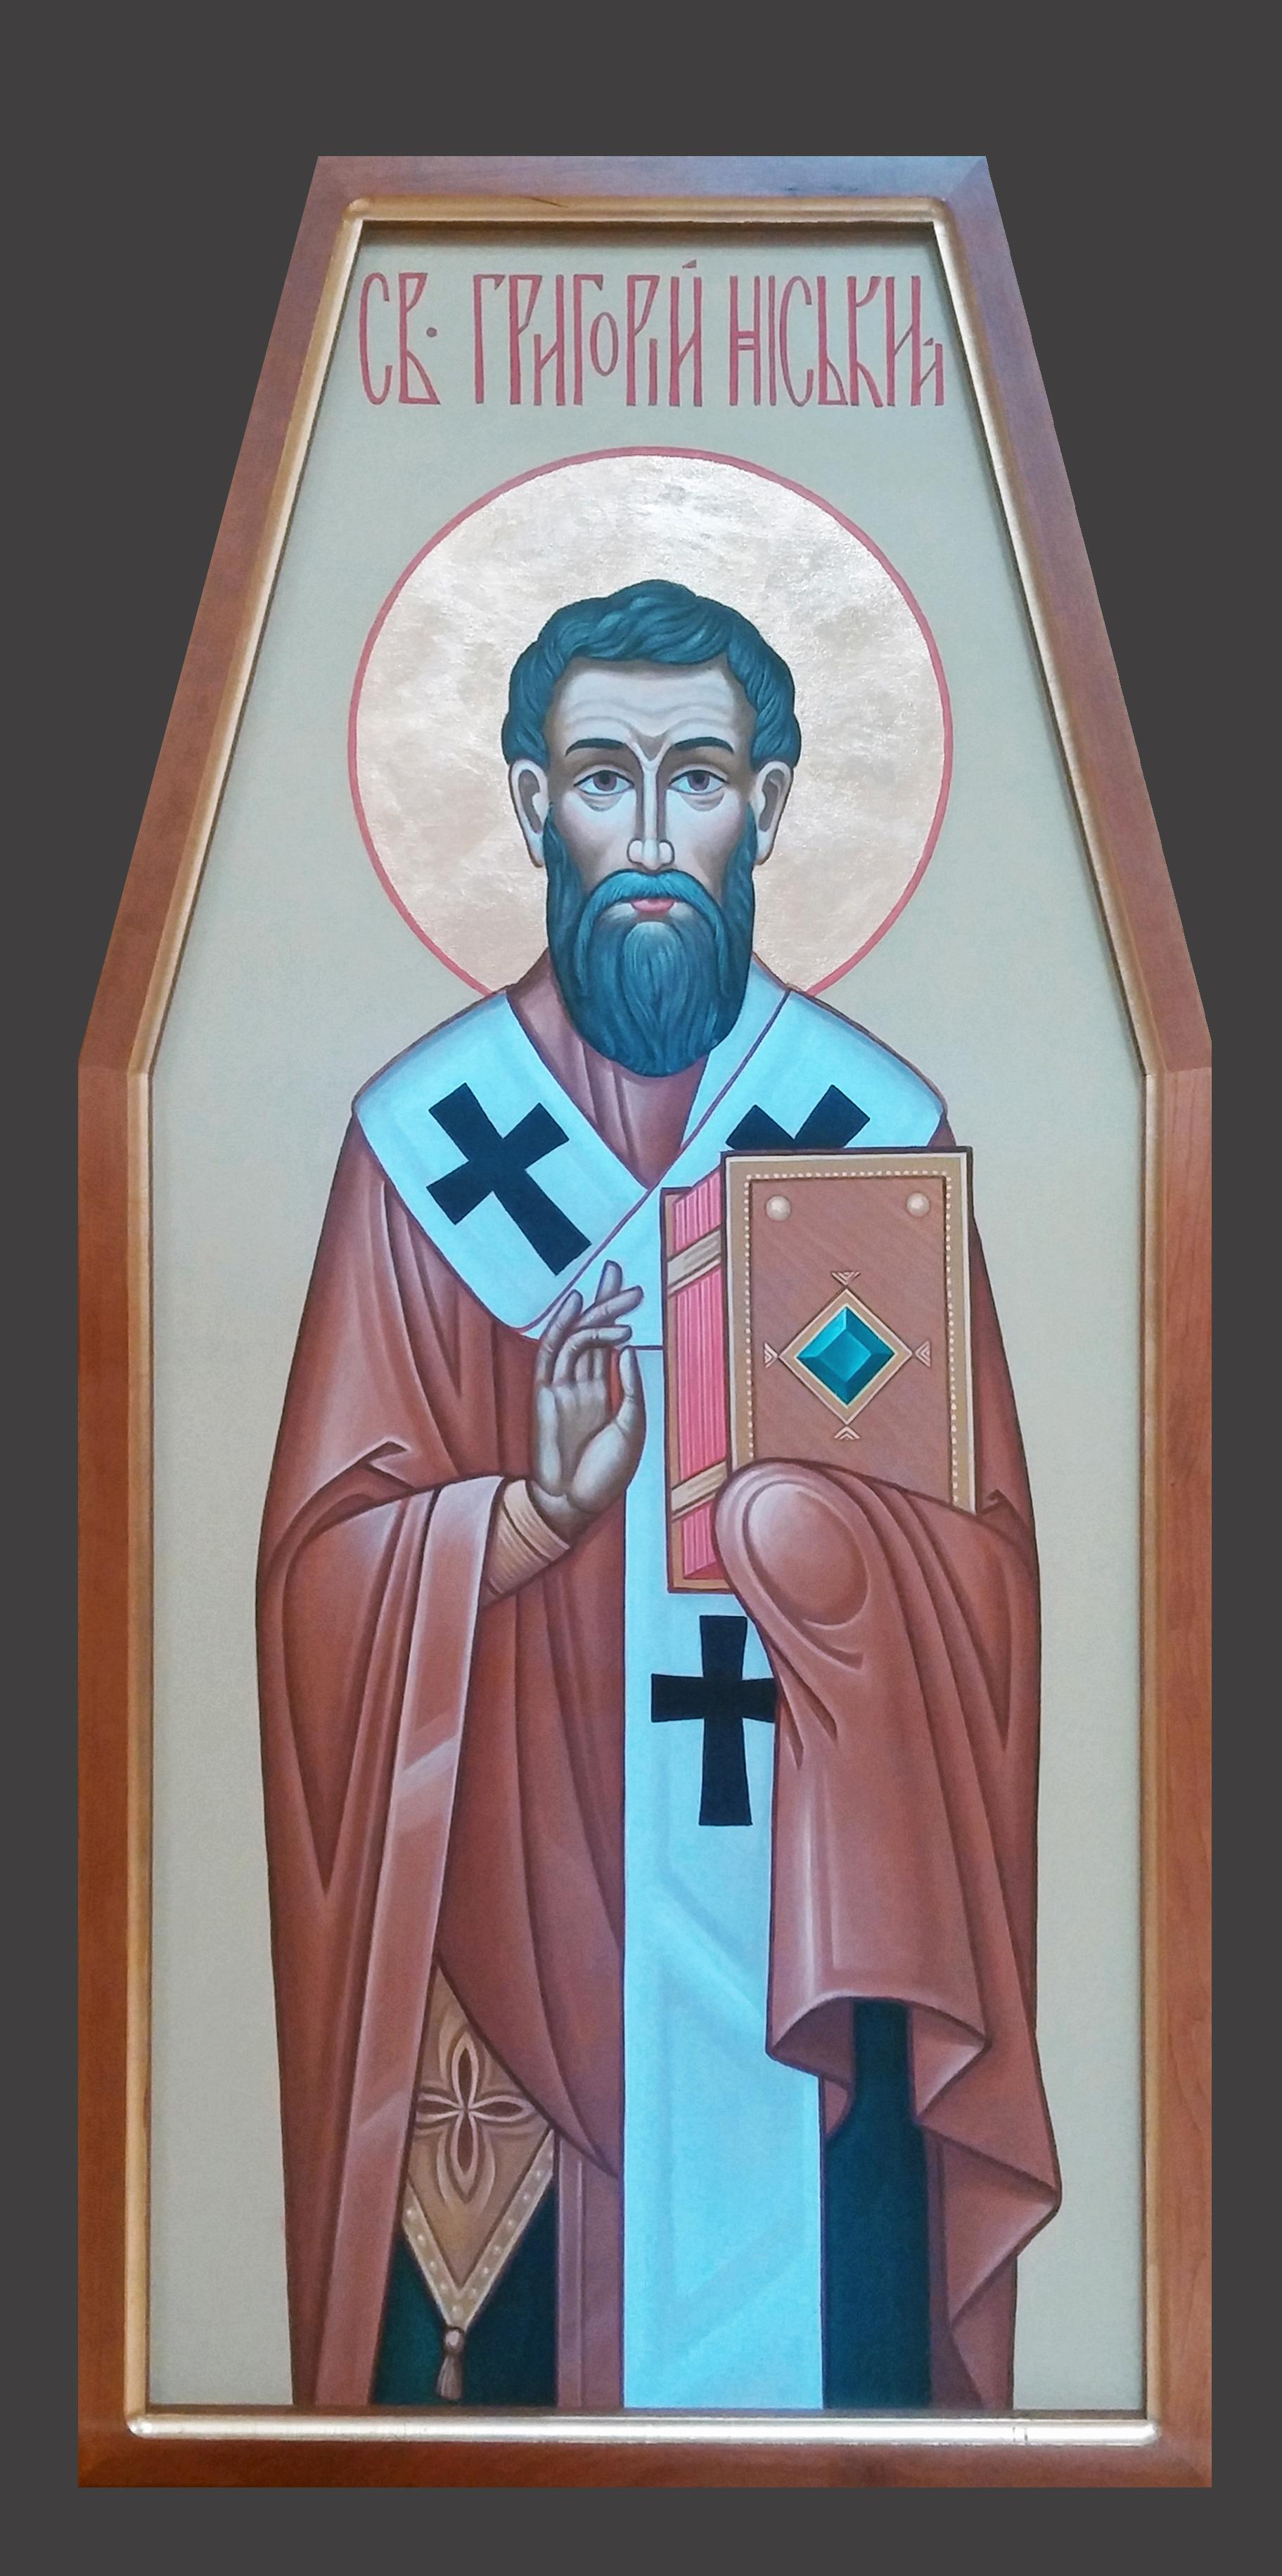 Saint Gregory of Nicea